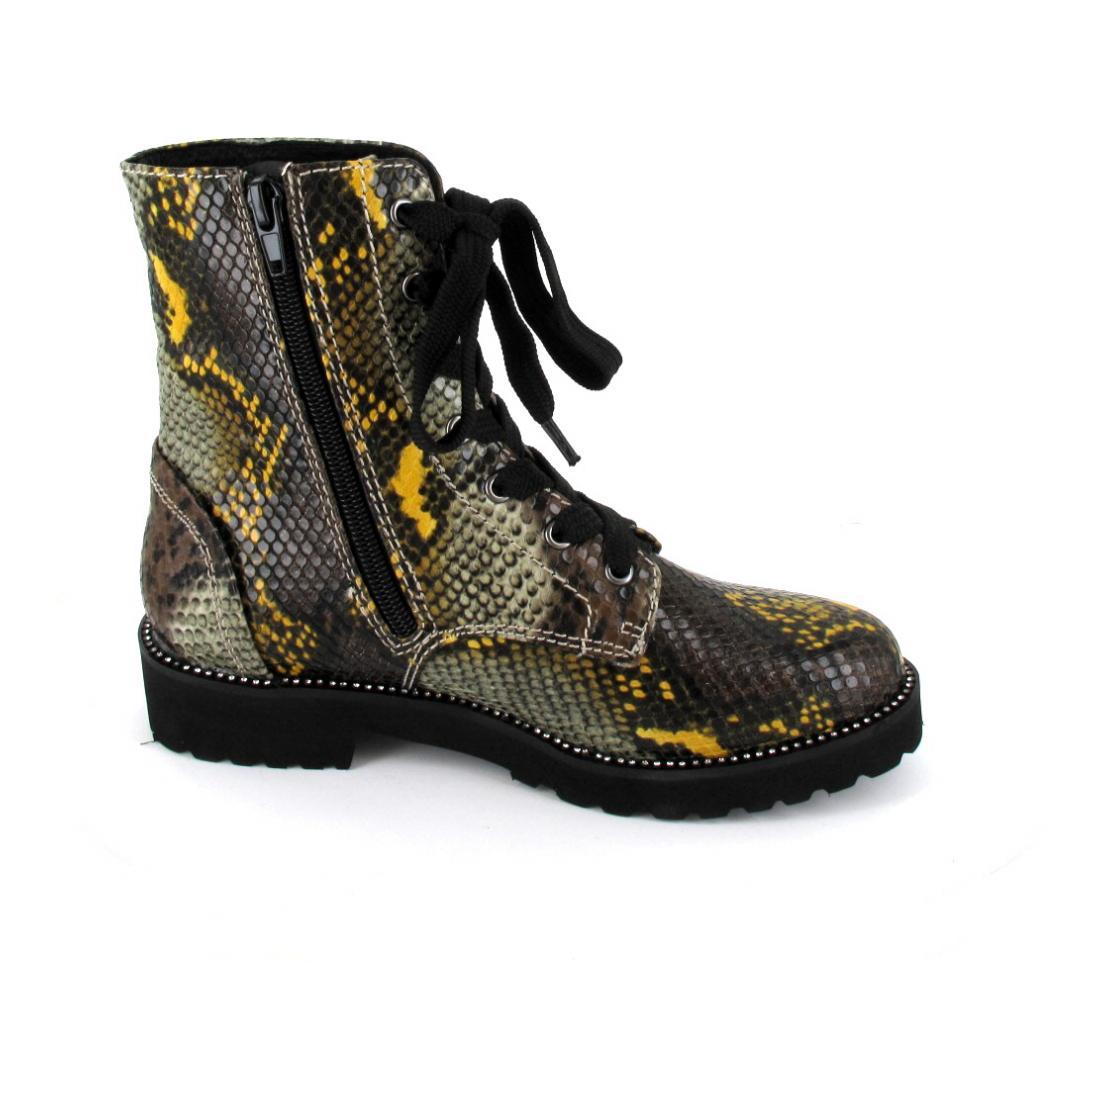 La Strada Stiefelette Snake Yellow